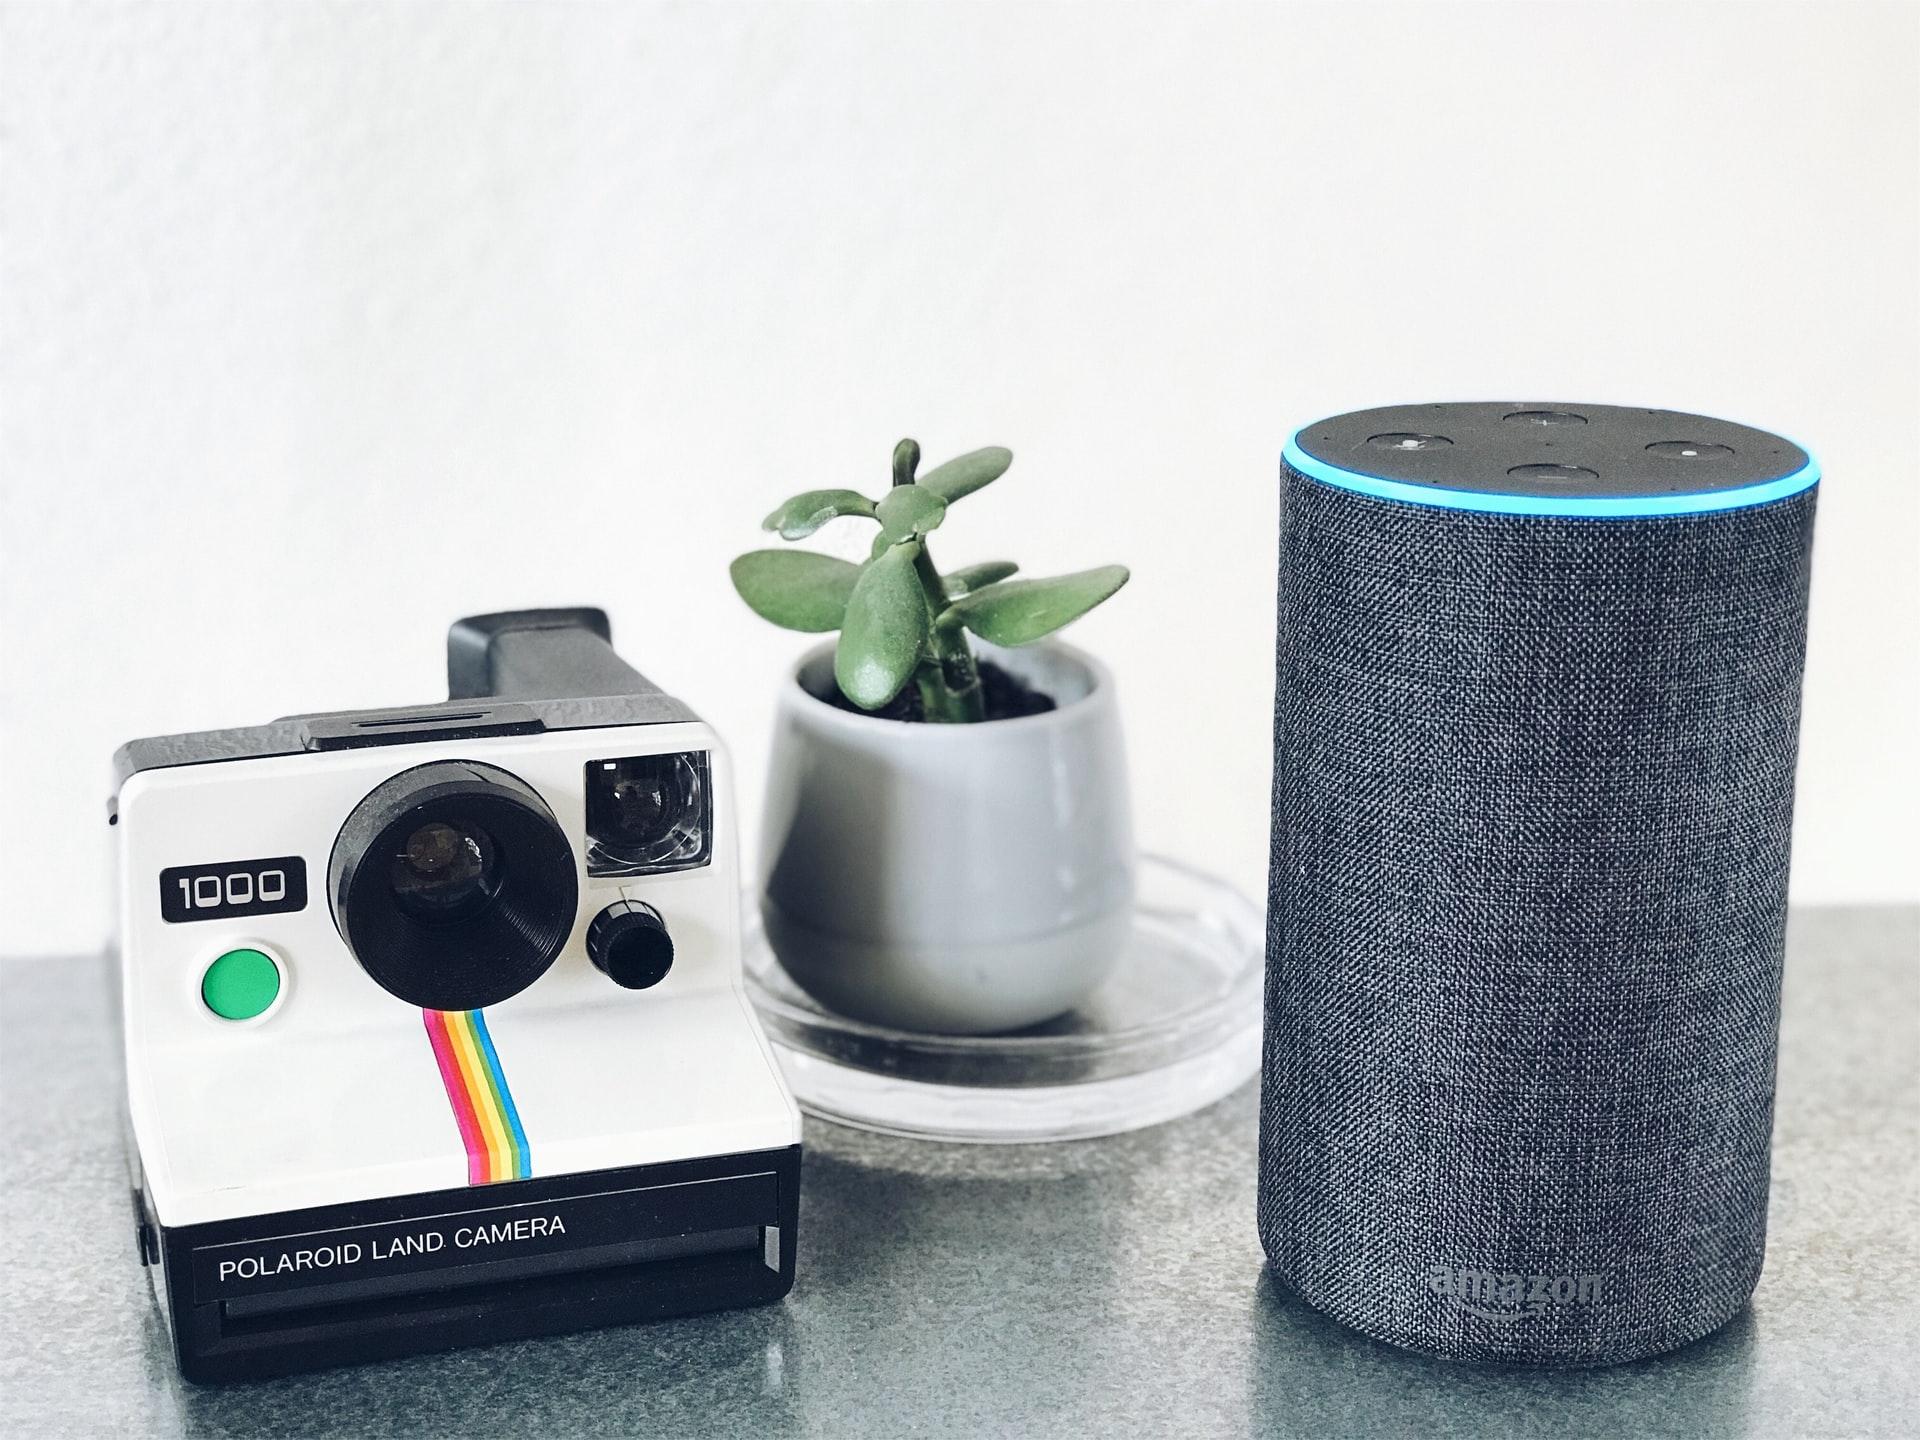 imagen de altavoces inteligentes de Amazon